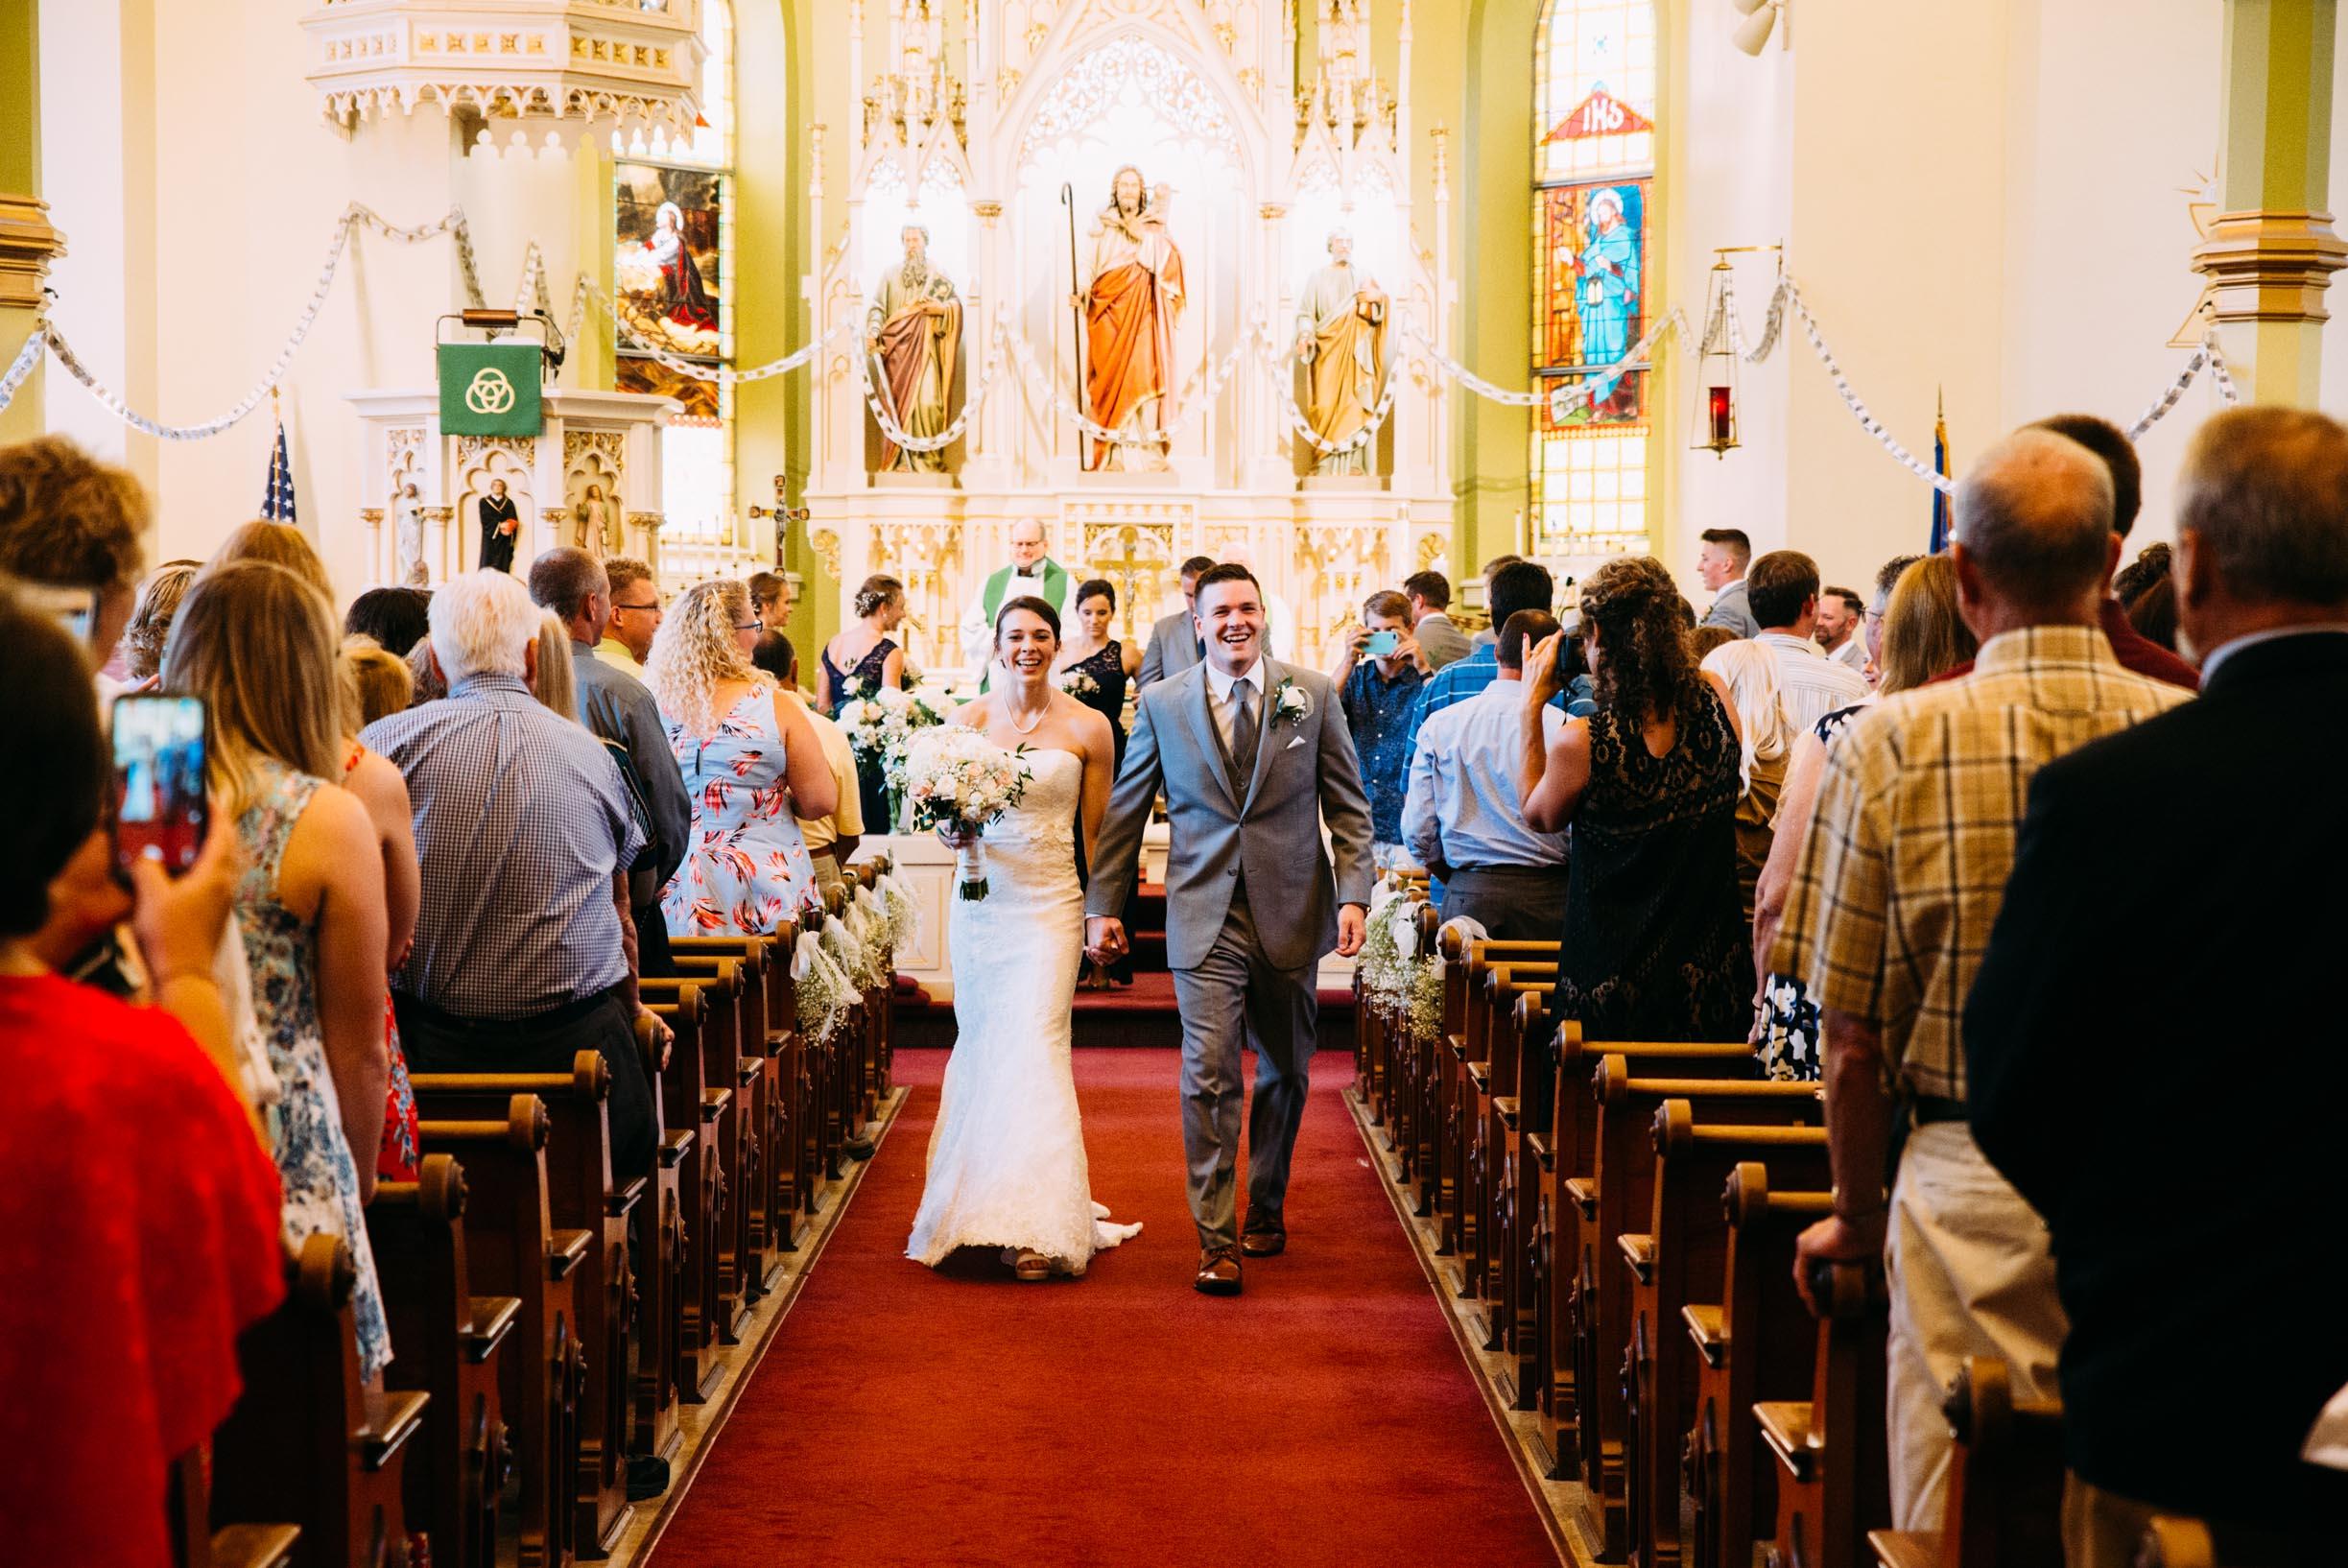 16-Lindsey Jake Wedding Winona St Martin's Lutheran Church.jpg